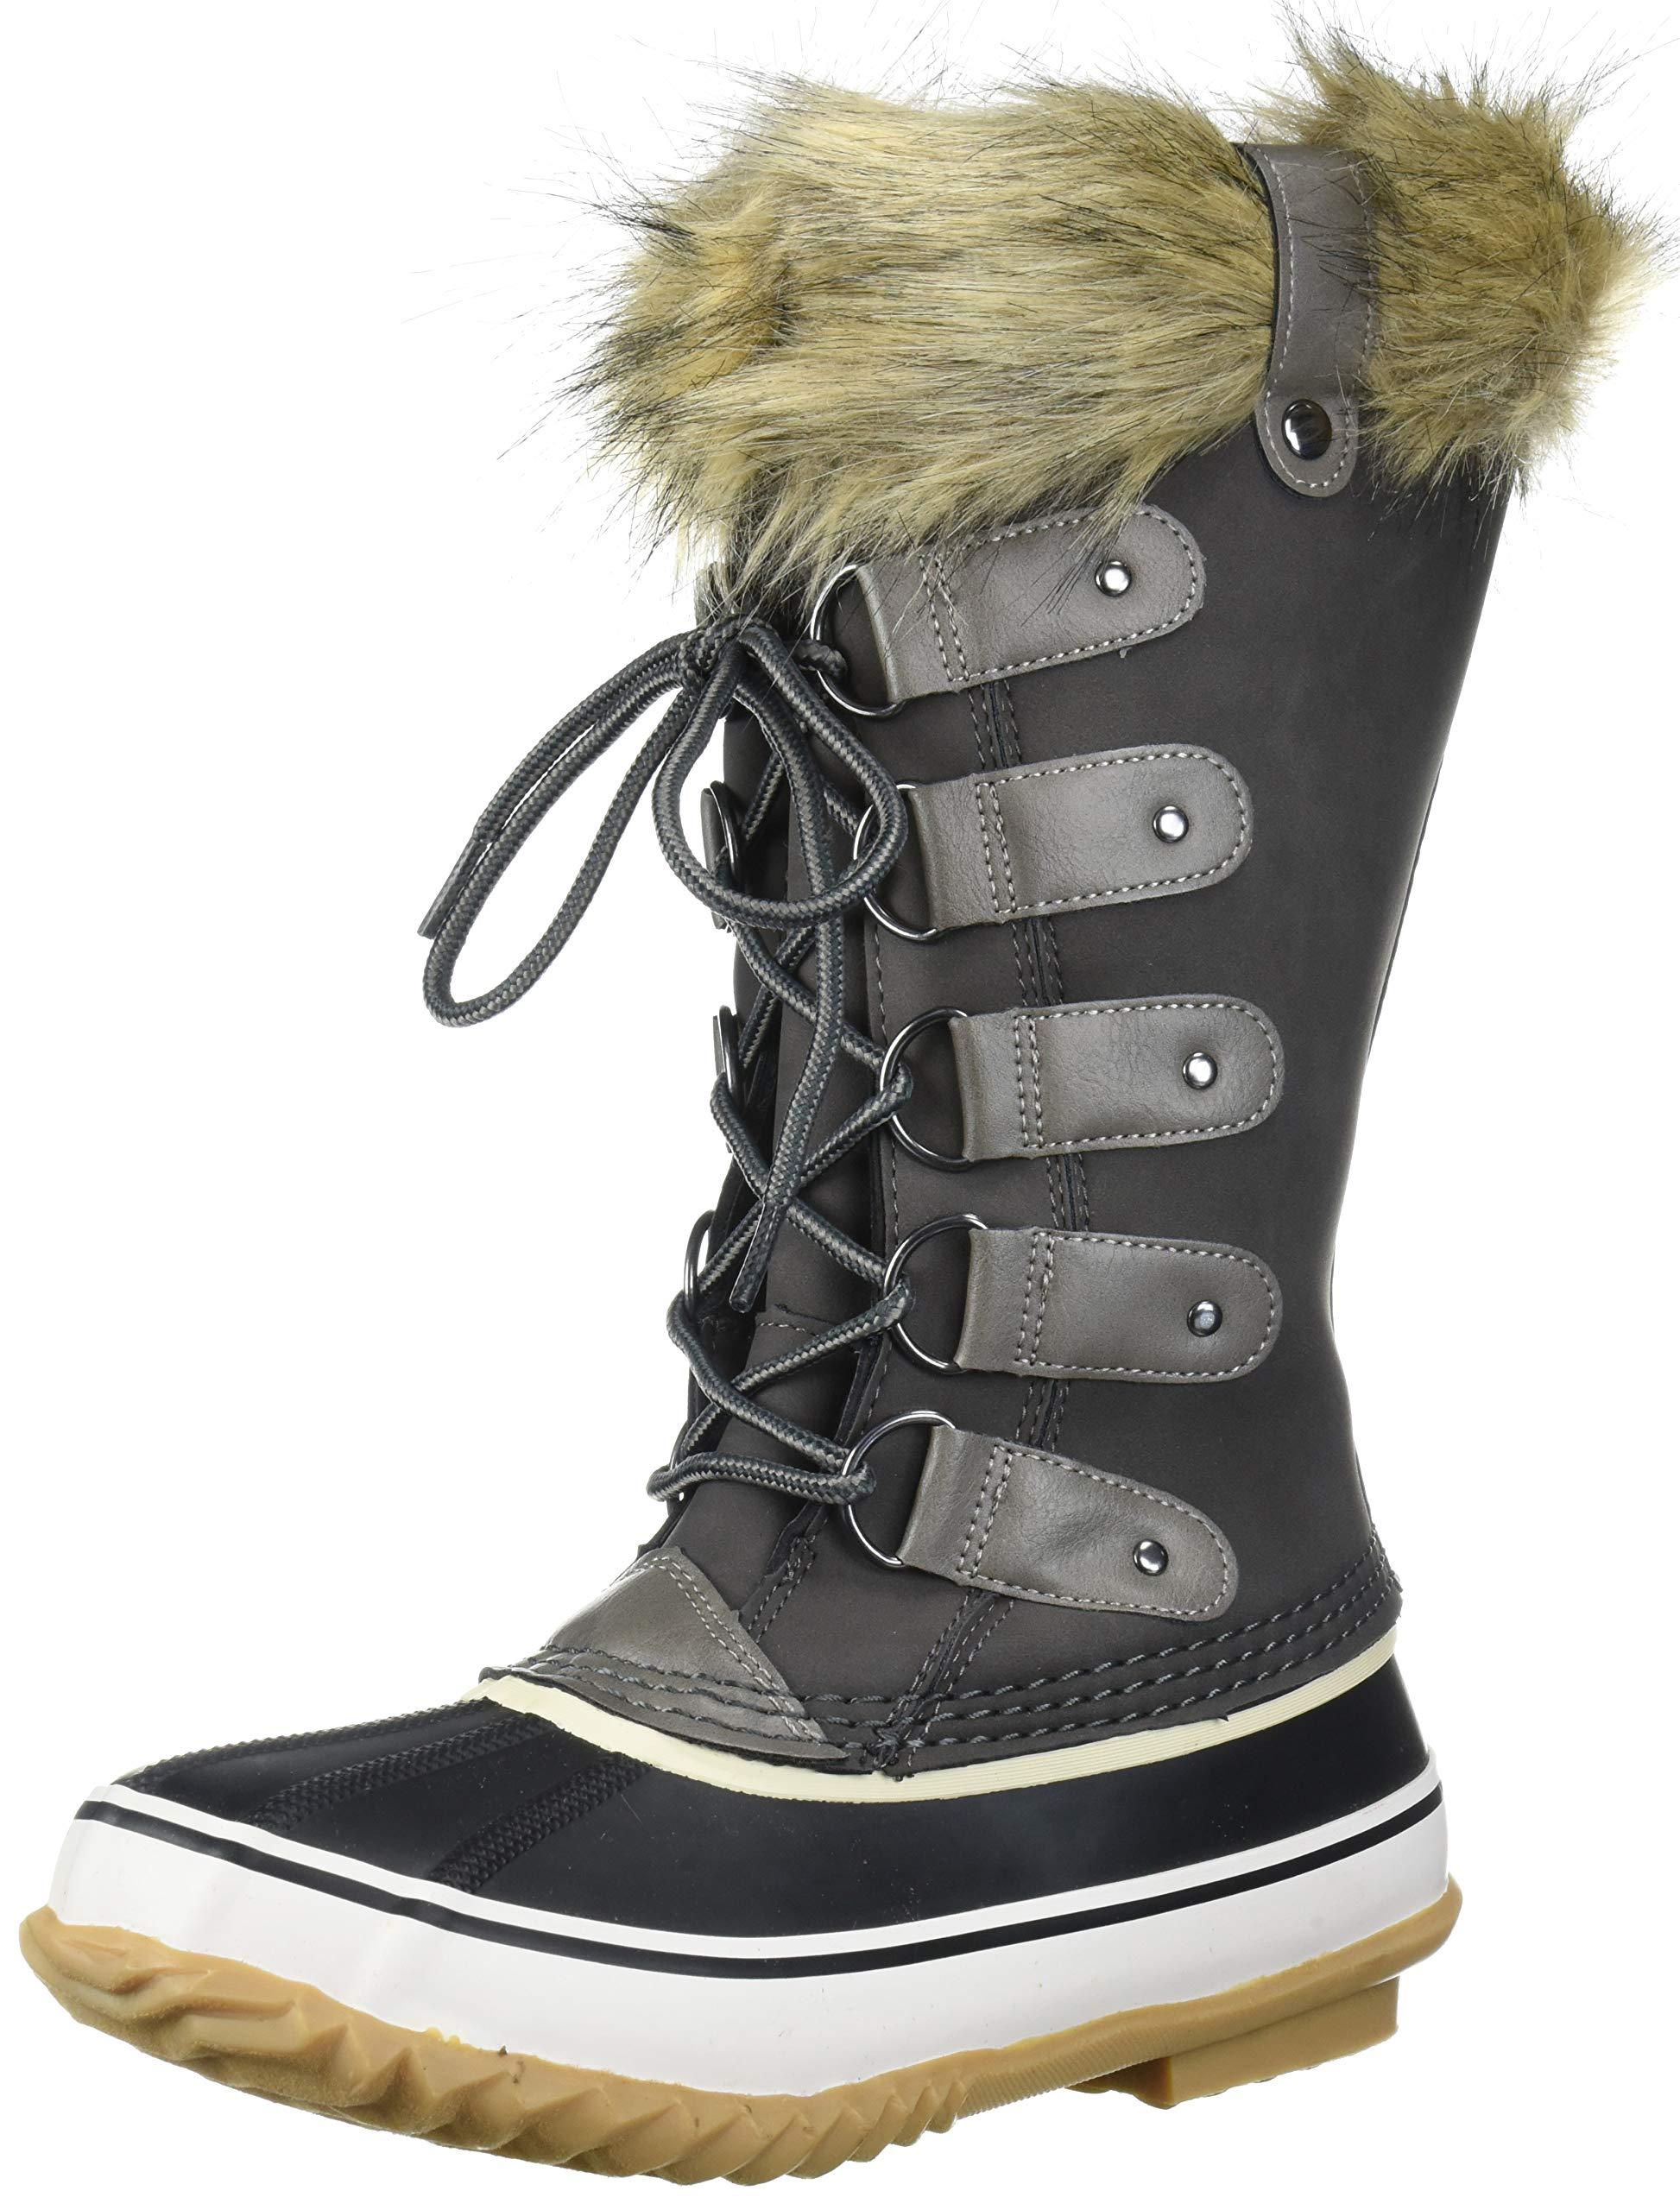 JBU by Jambu Women's Edith Encore Weather Ready Snow Boot